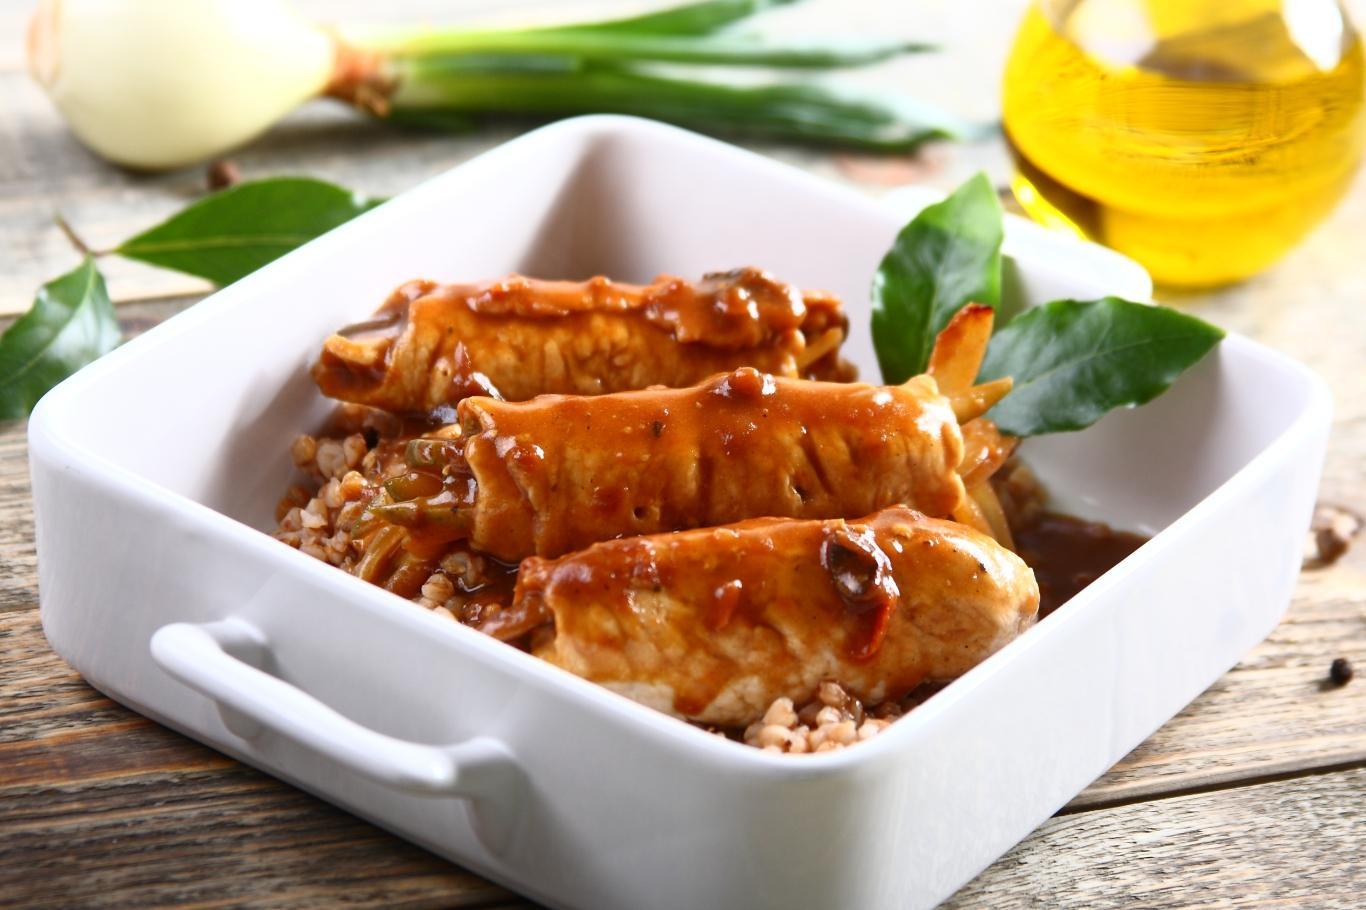 Zrazy, món ăn truyền thống Ba Lan